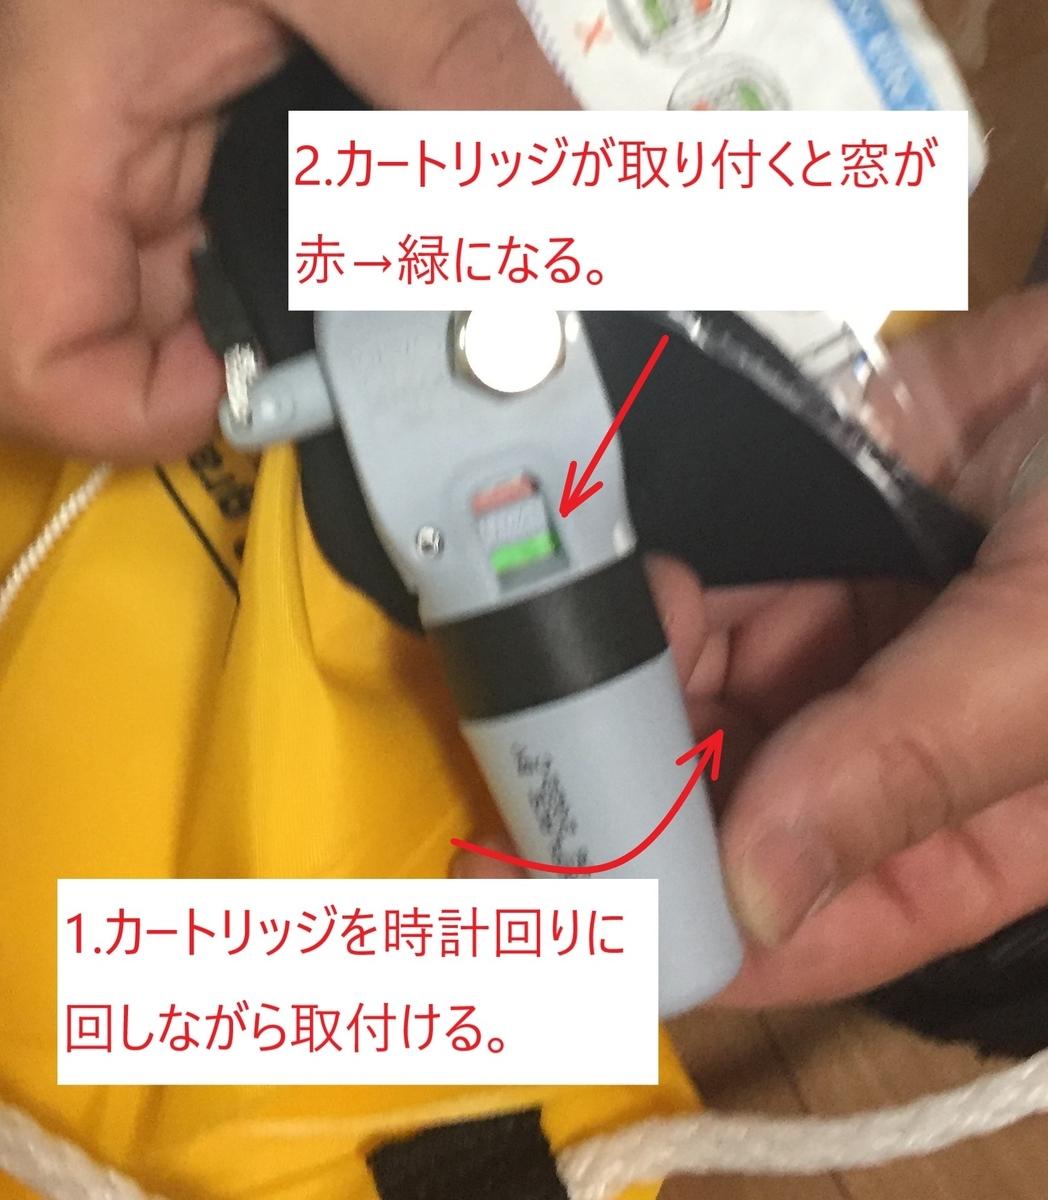 f:id:kazuyangon:20190409010843j:plain